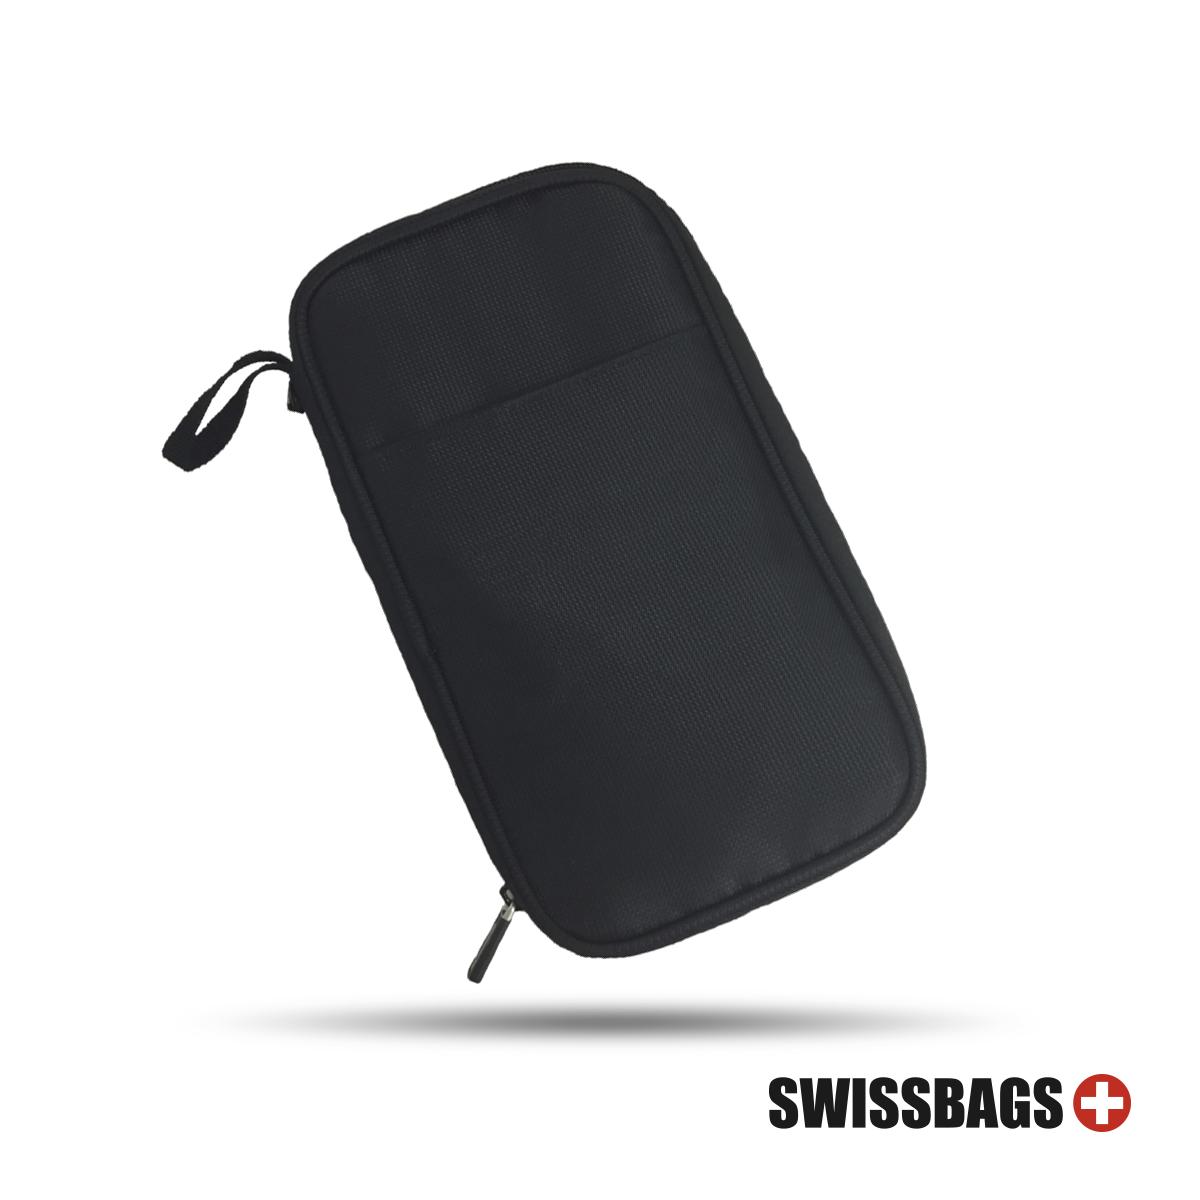 Passport Holder Swissbags